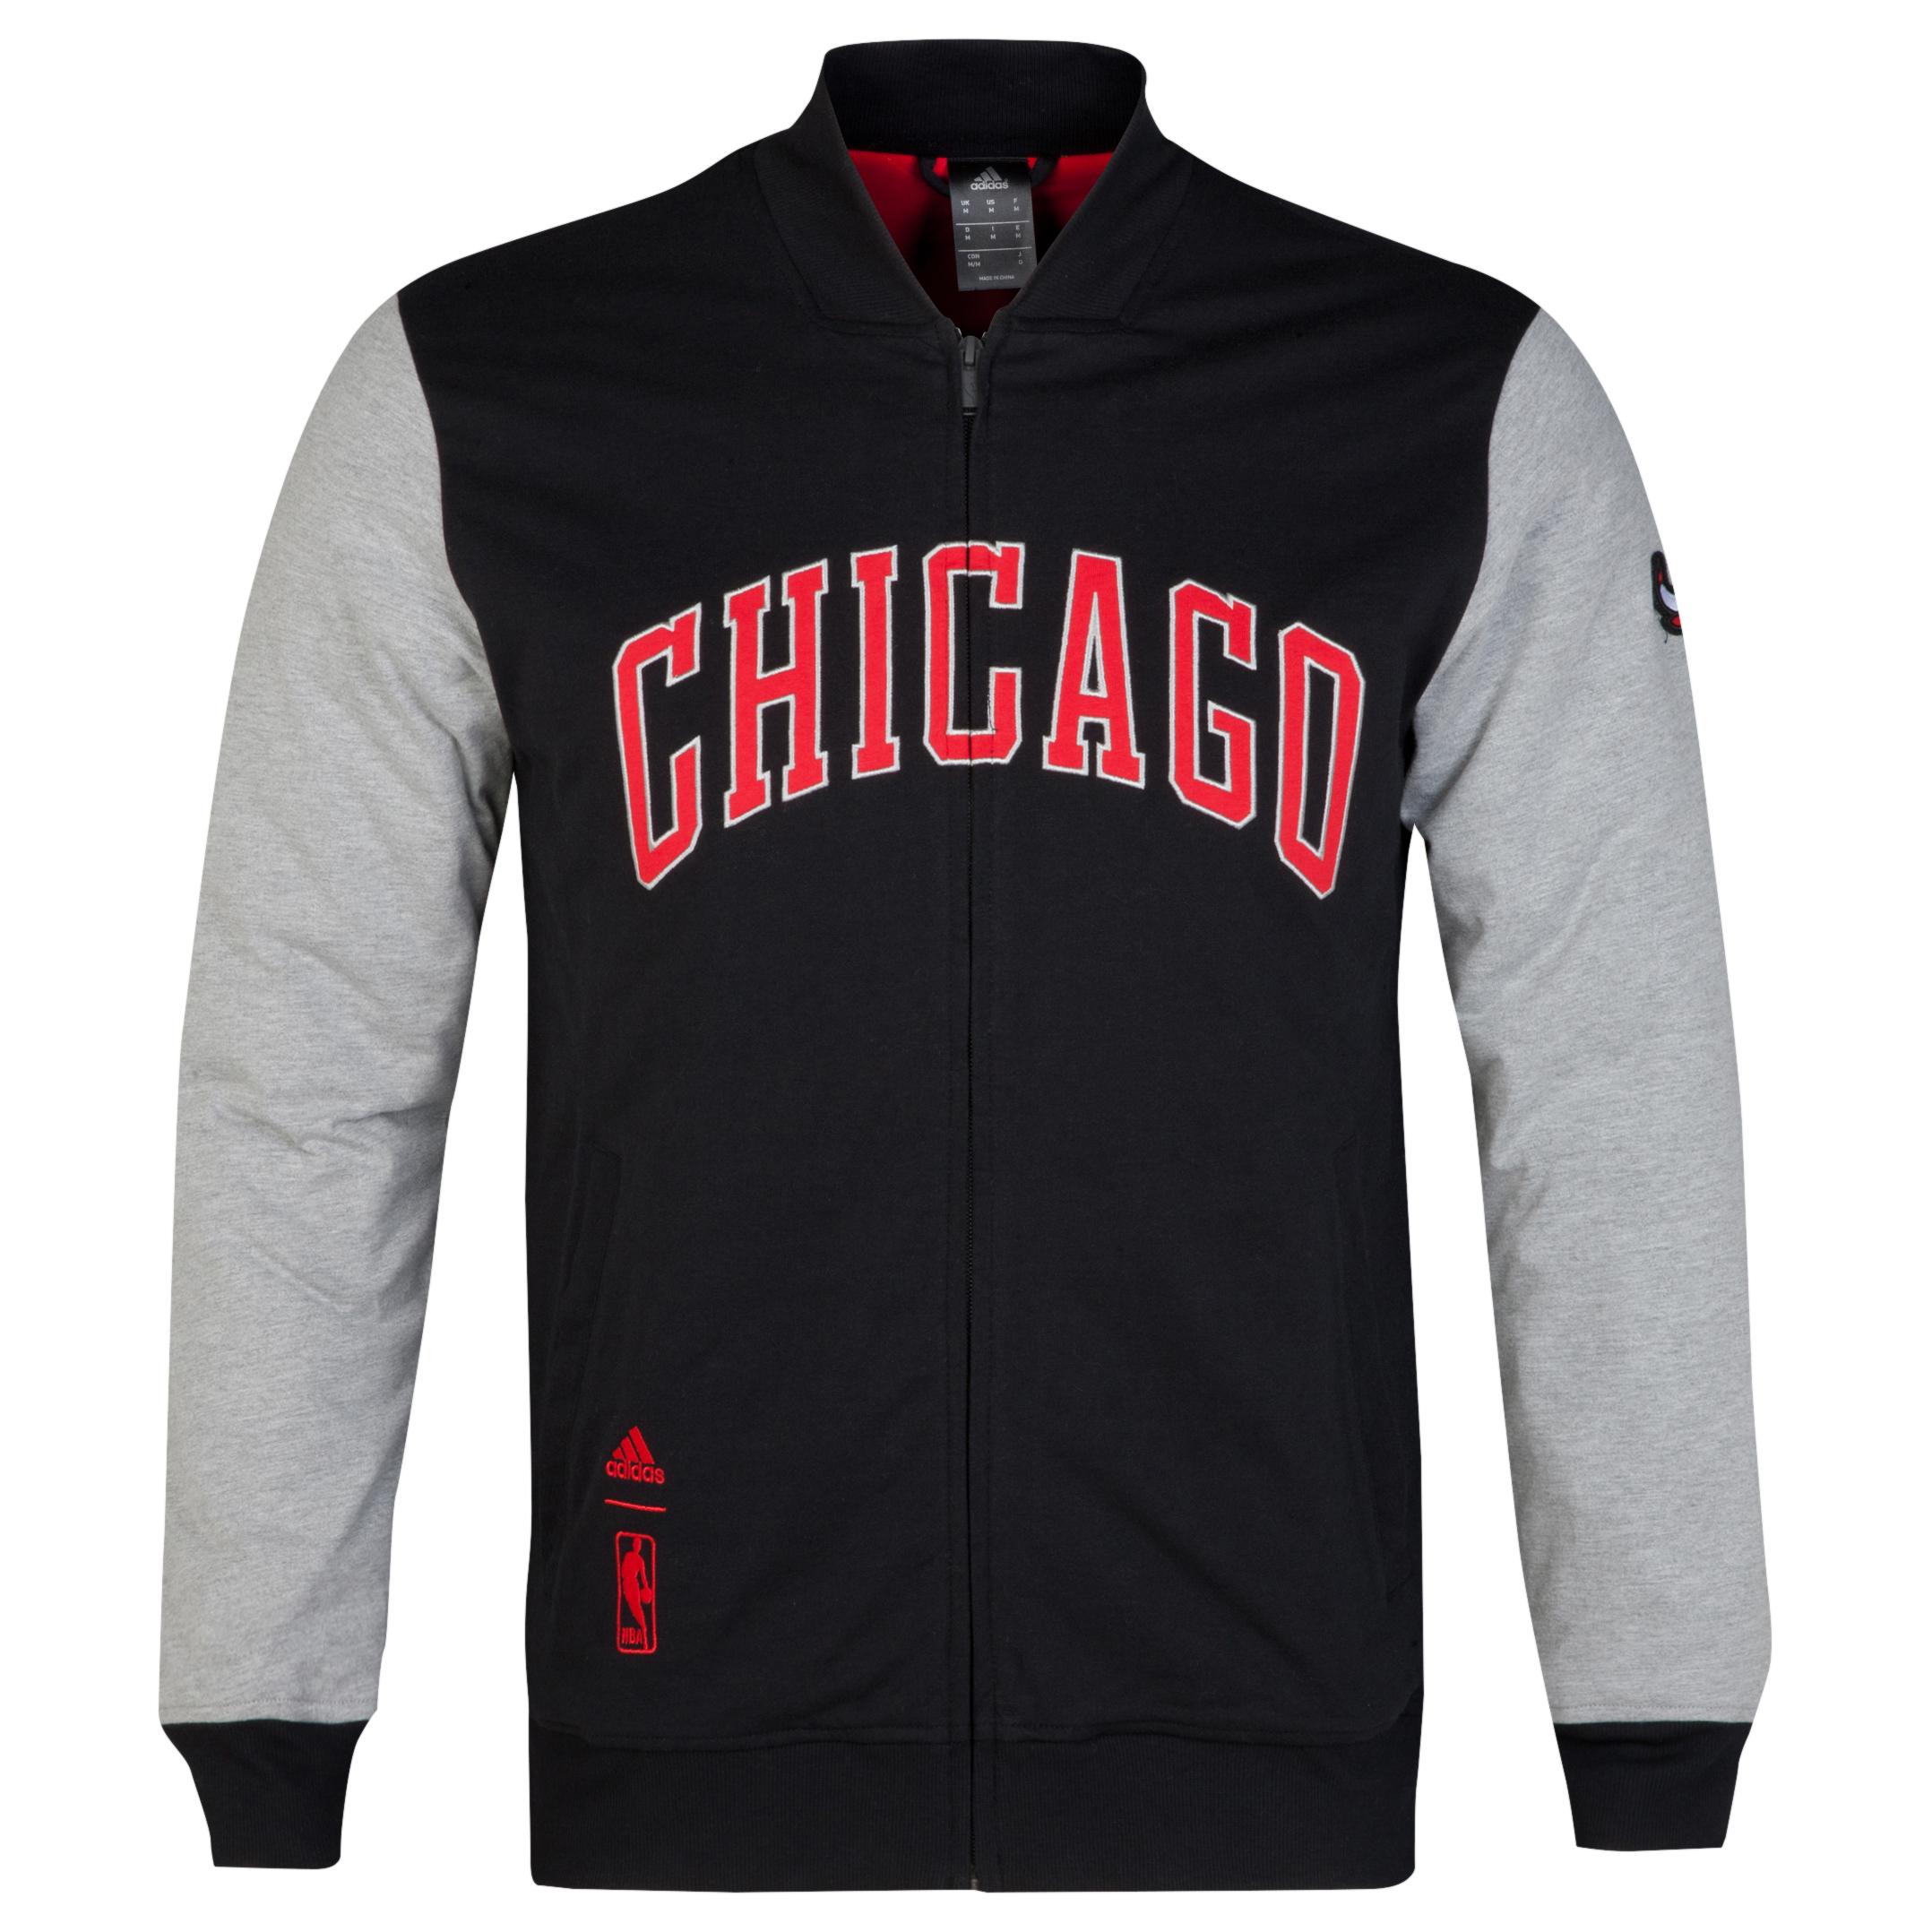 Chicago Bulls Washed Letterman jacket Black